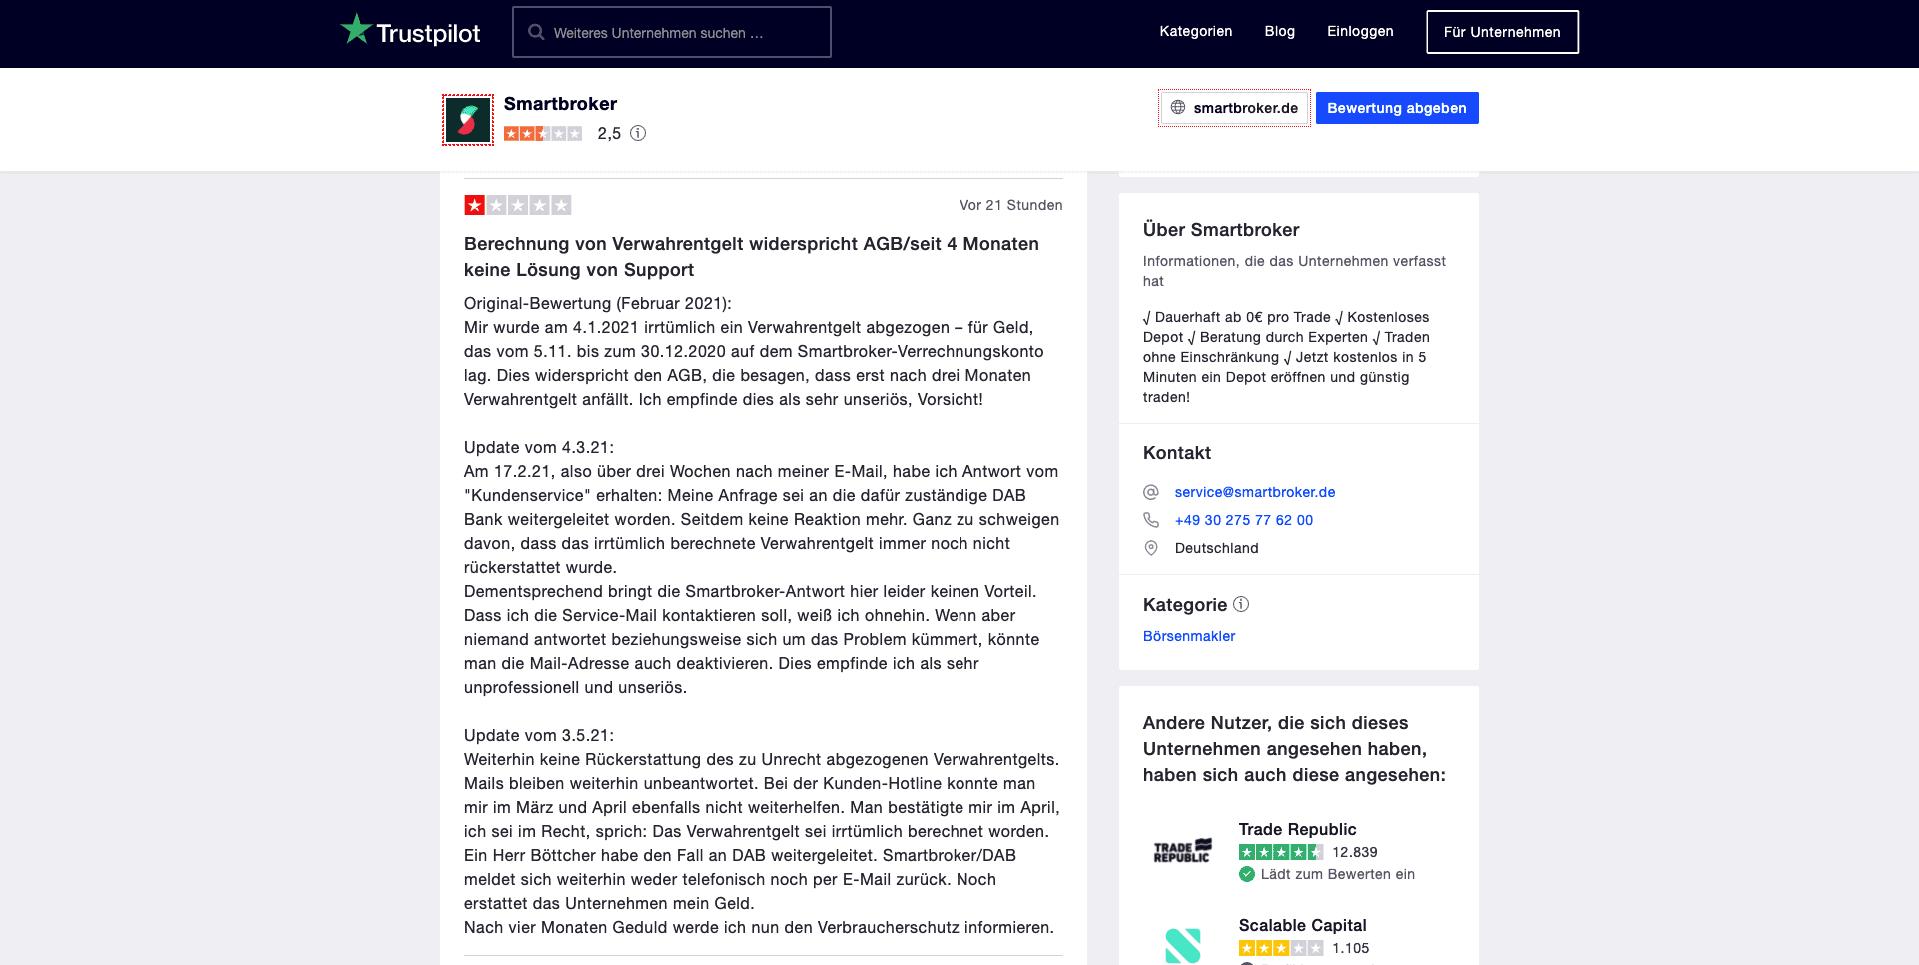 Smartbroker reviews